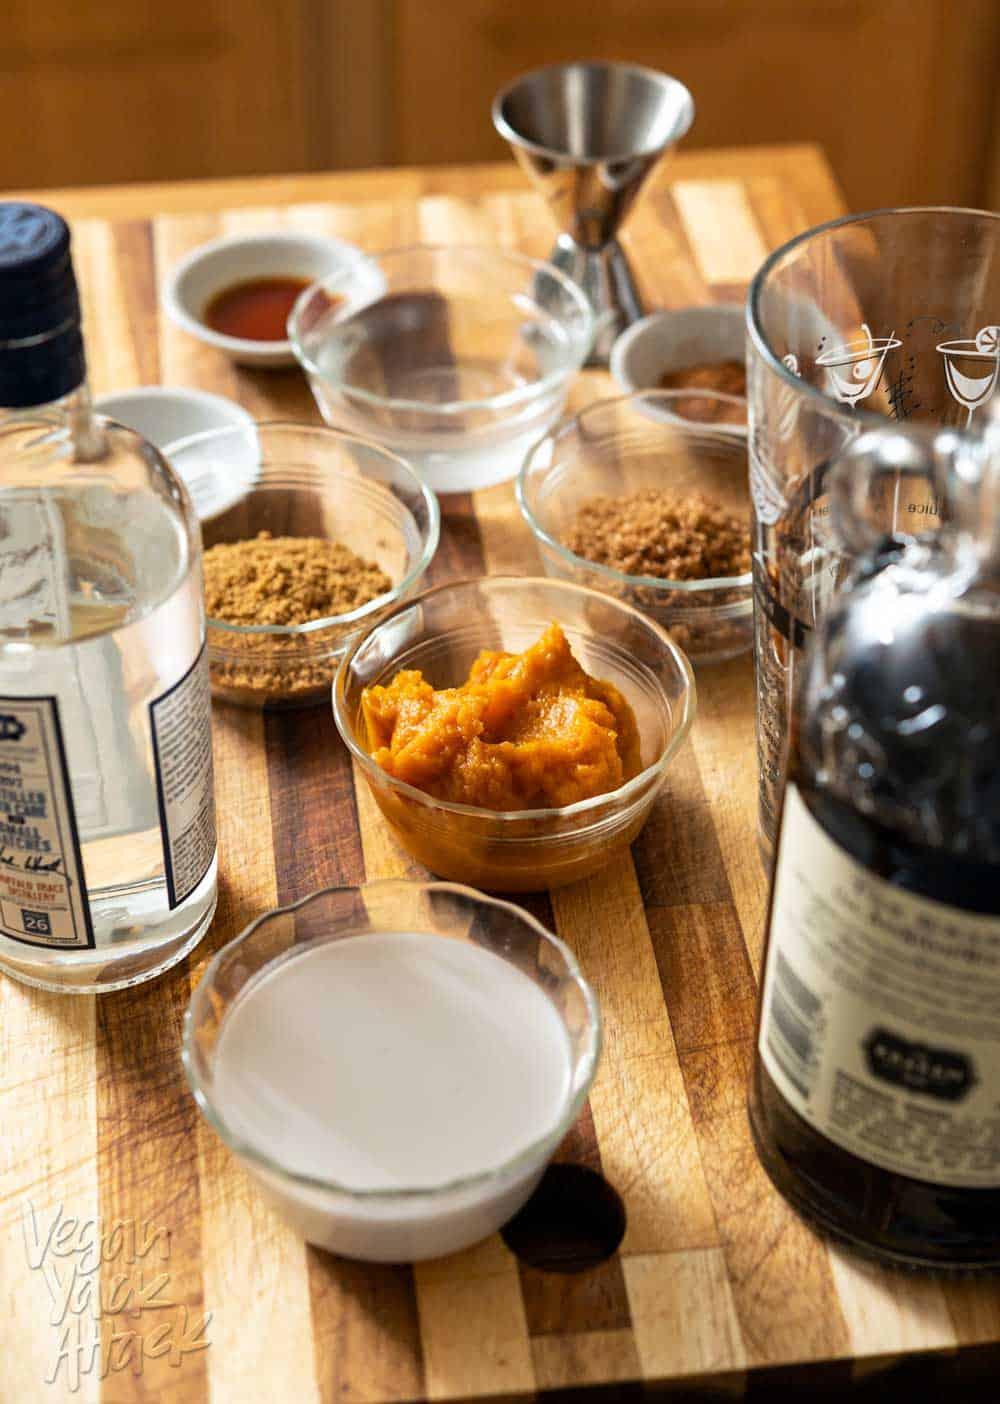 Pumpkin, sugar, cookie crumbs, and more in ramekins on a cutting board